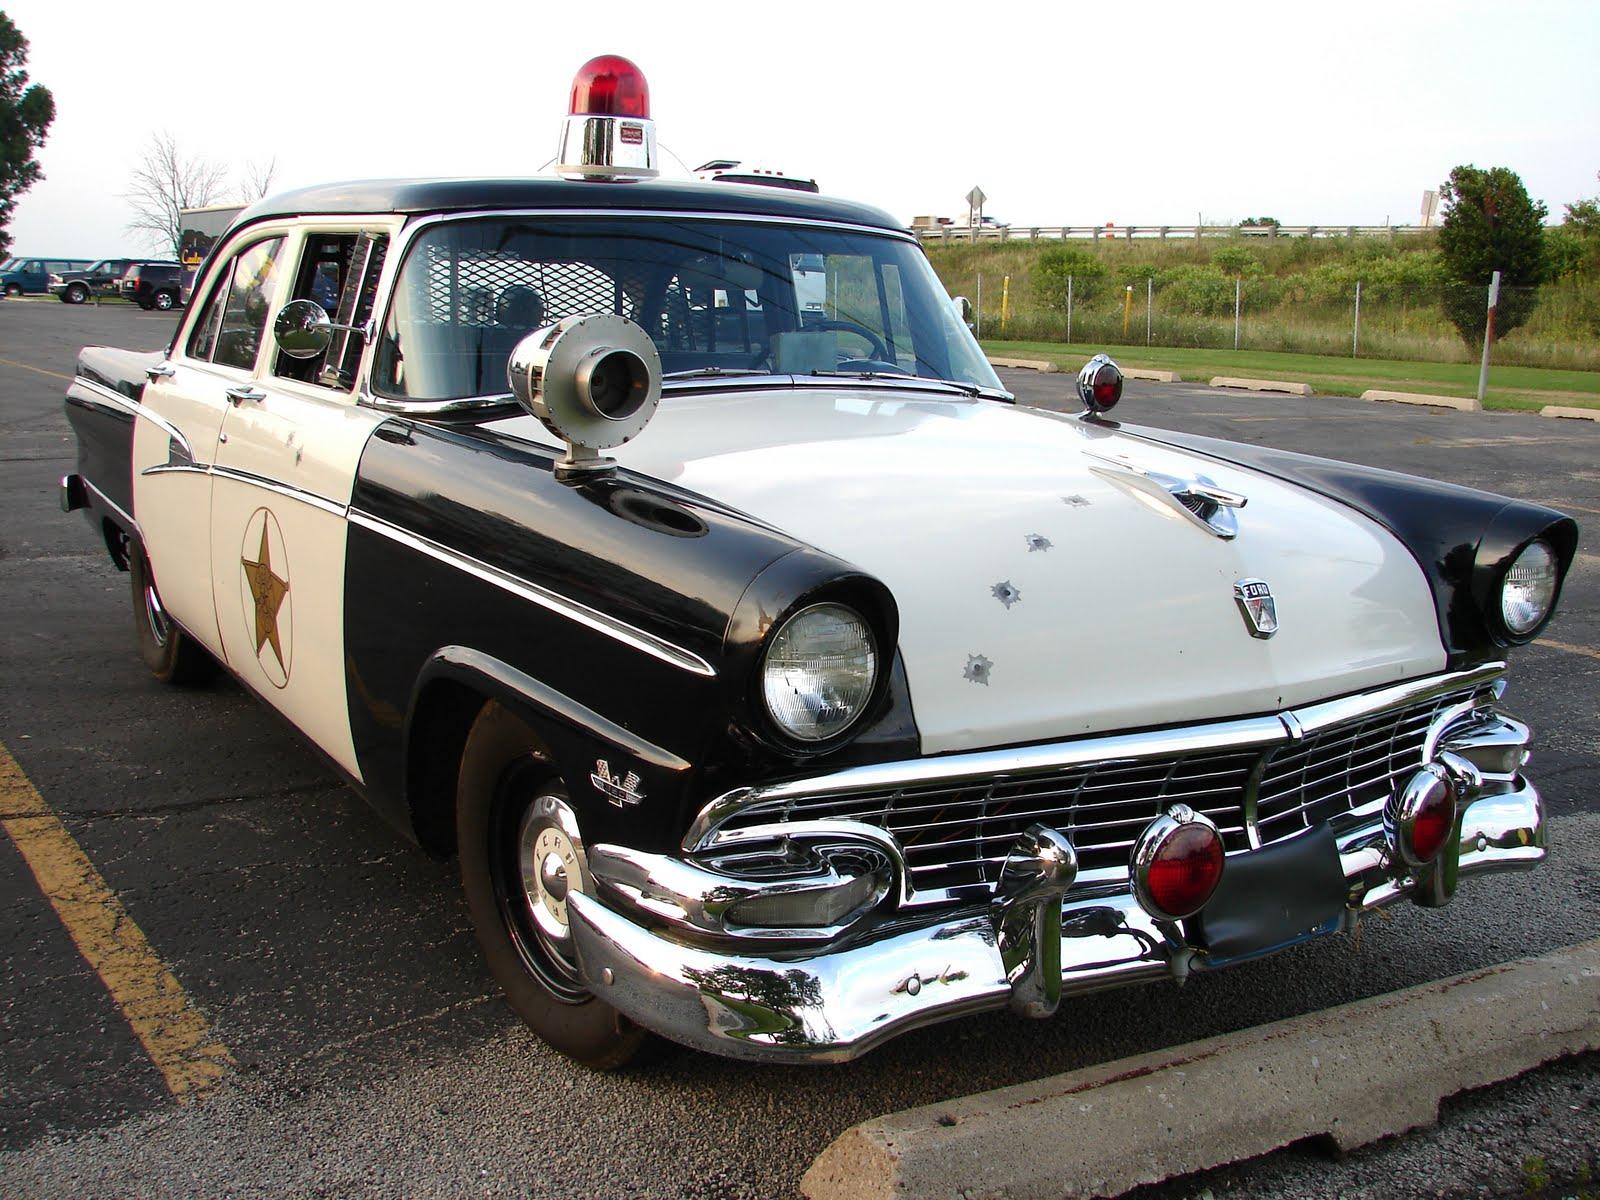 vintage police cars |vintage cars